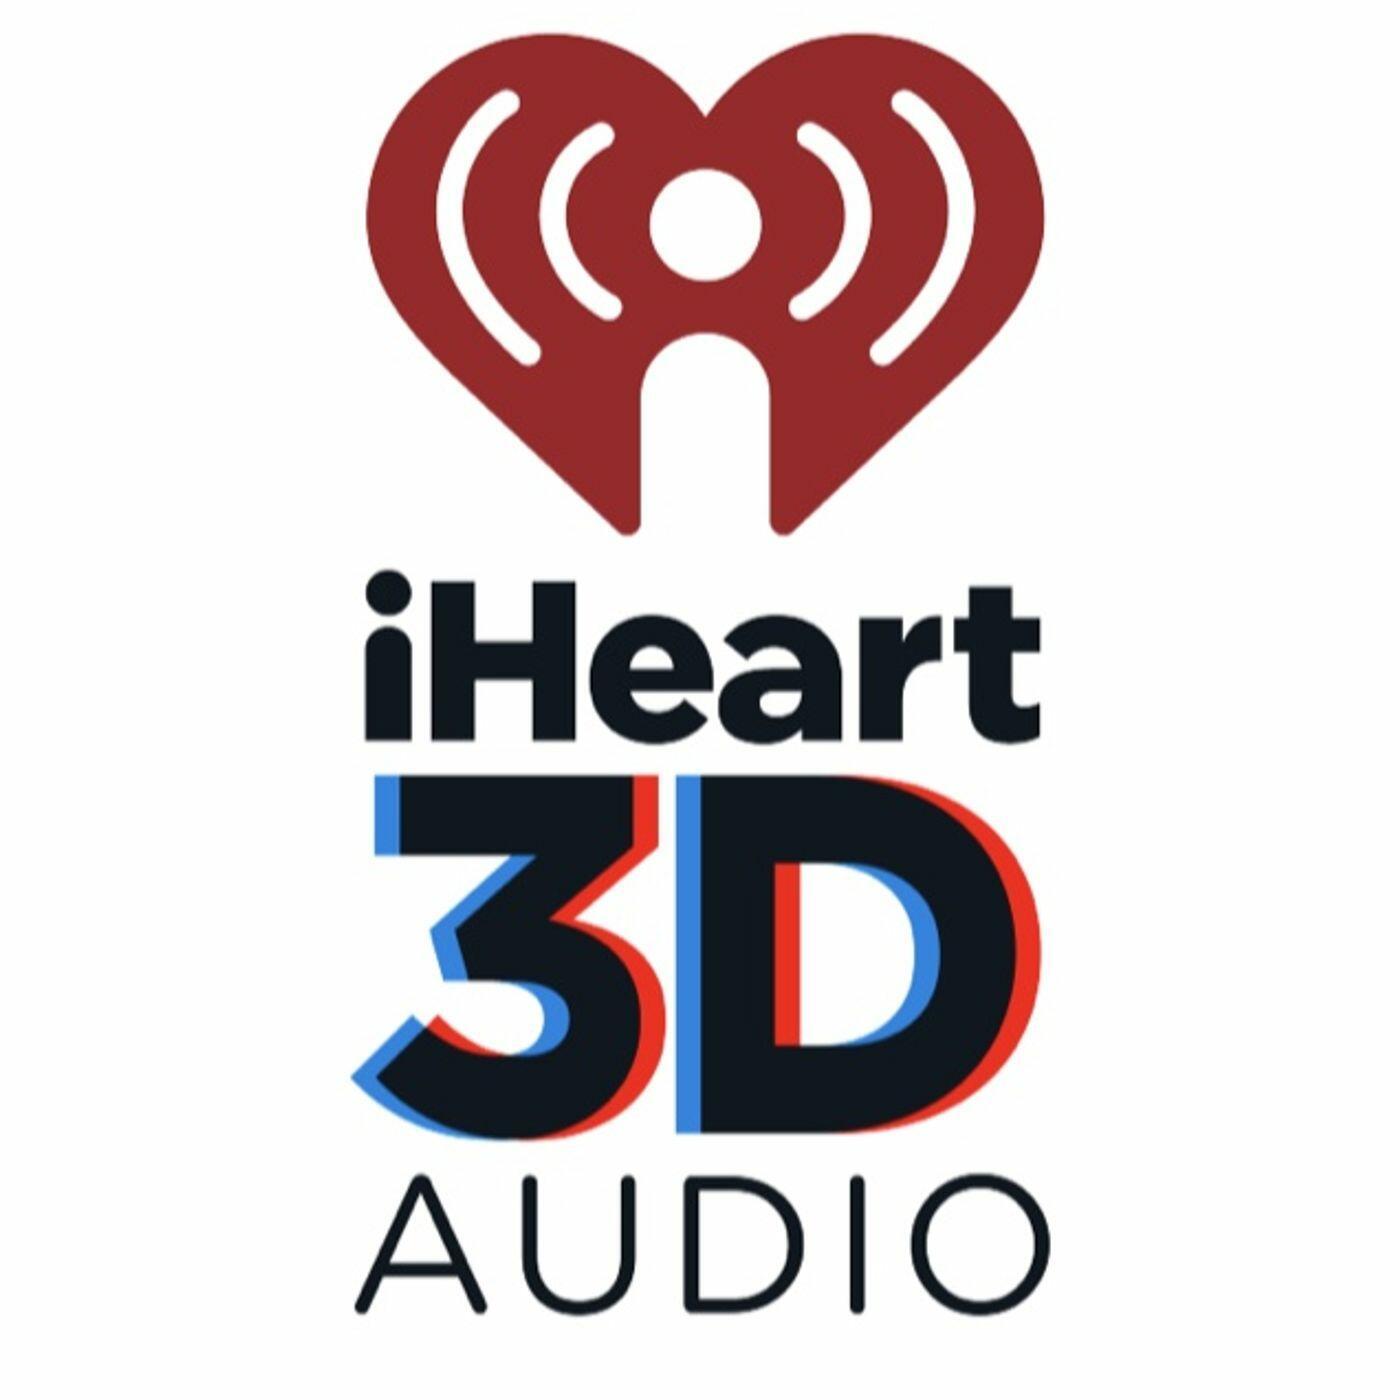 iHeart 3D Audio